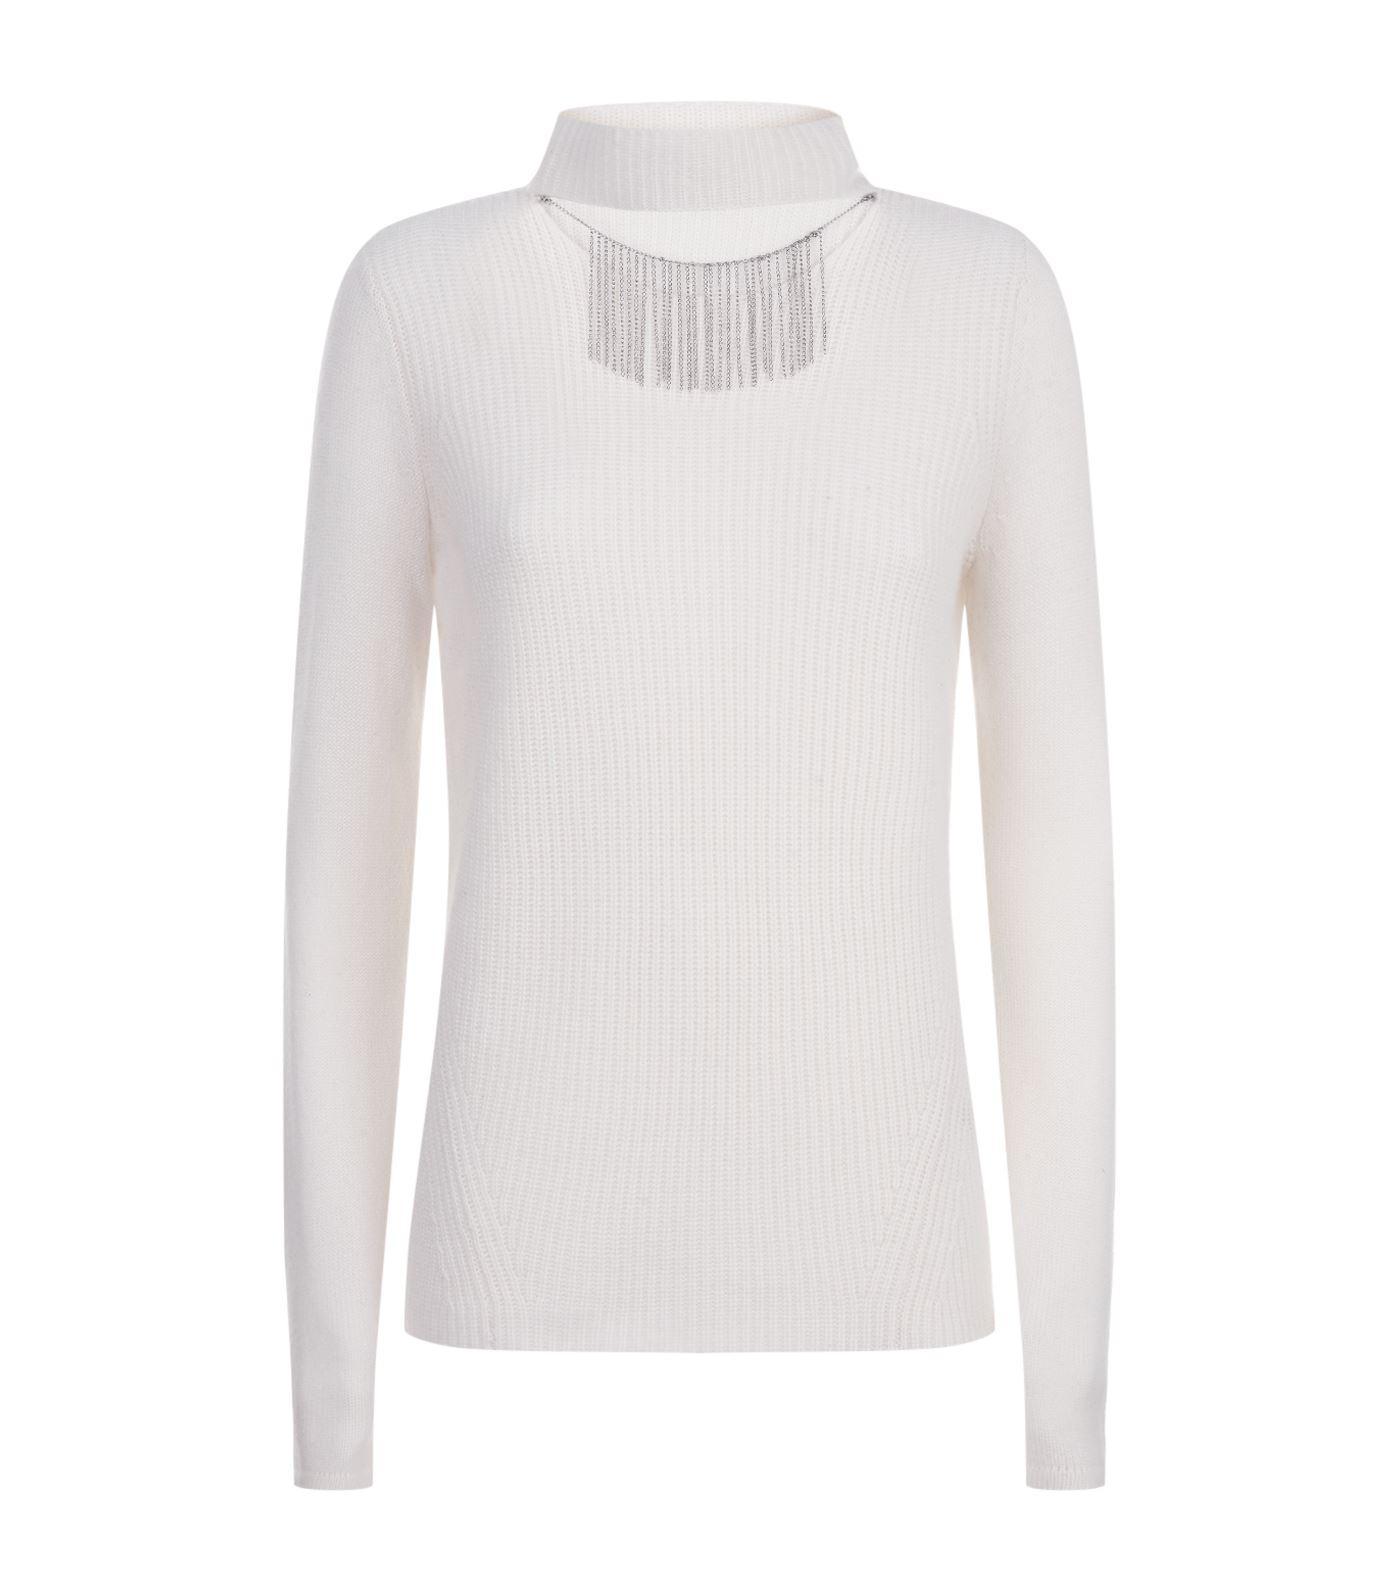 Elie Tahari oz Chain Cashmere Sweater In White